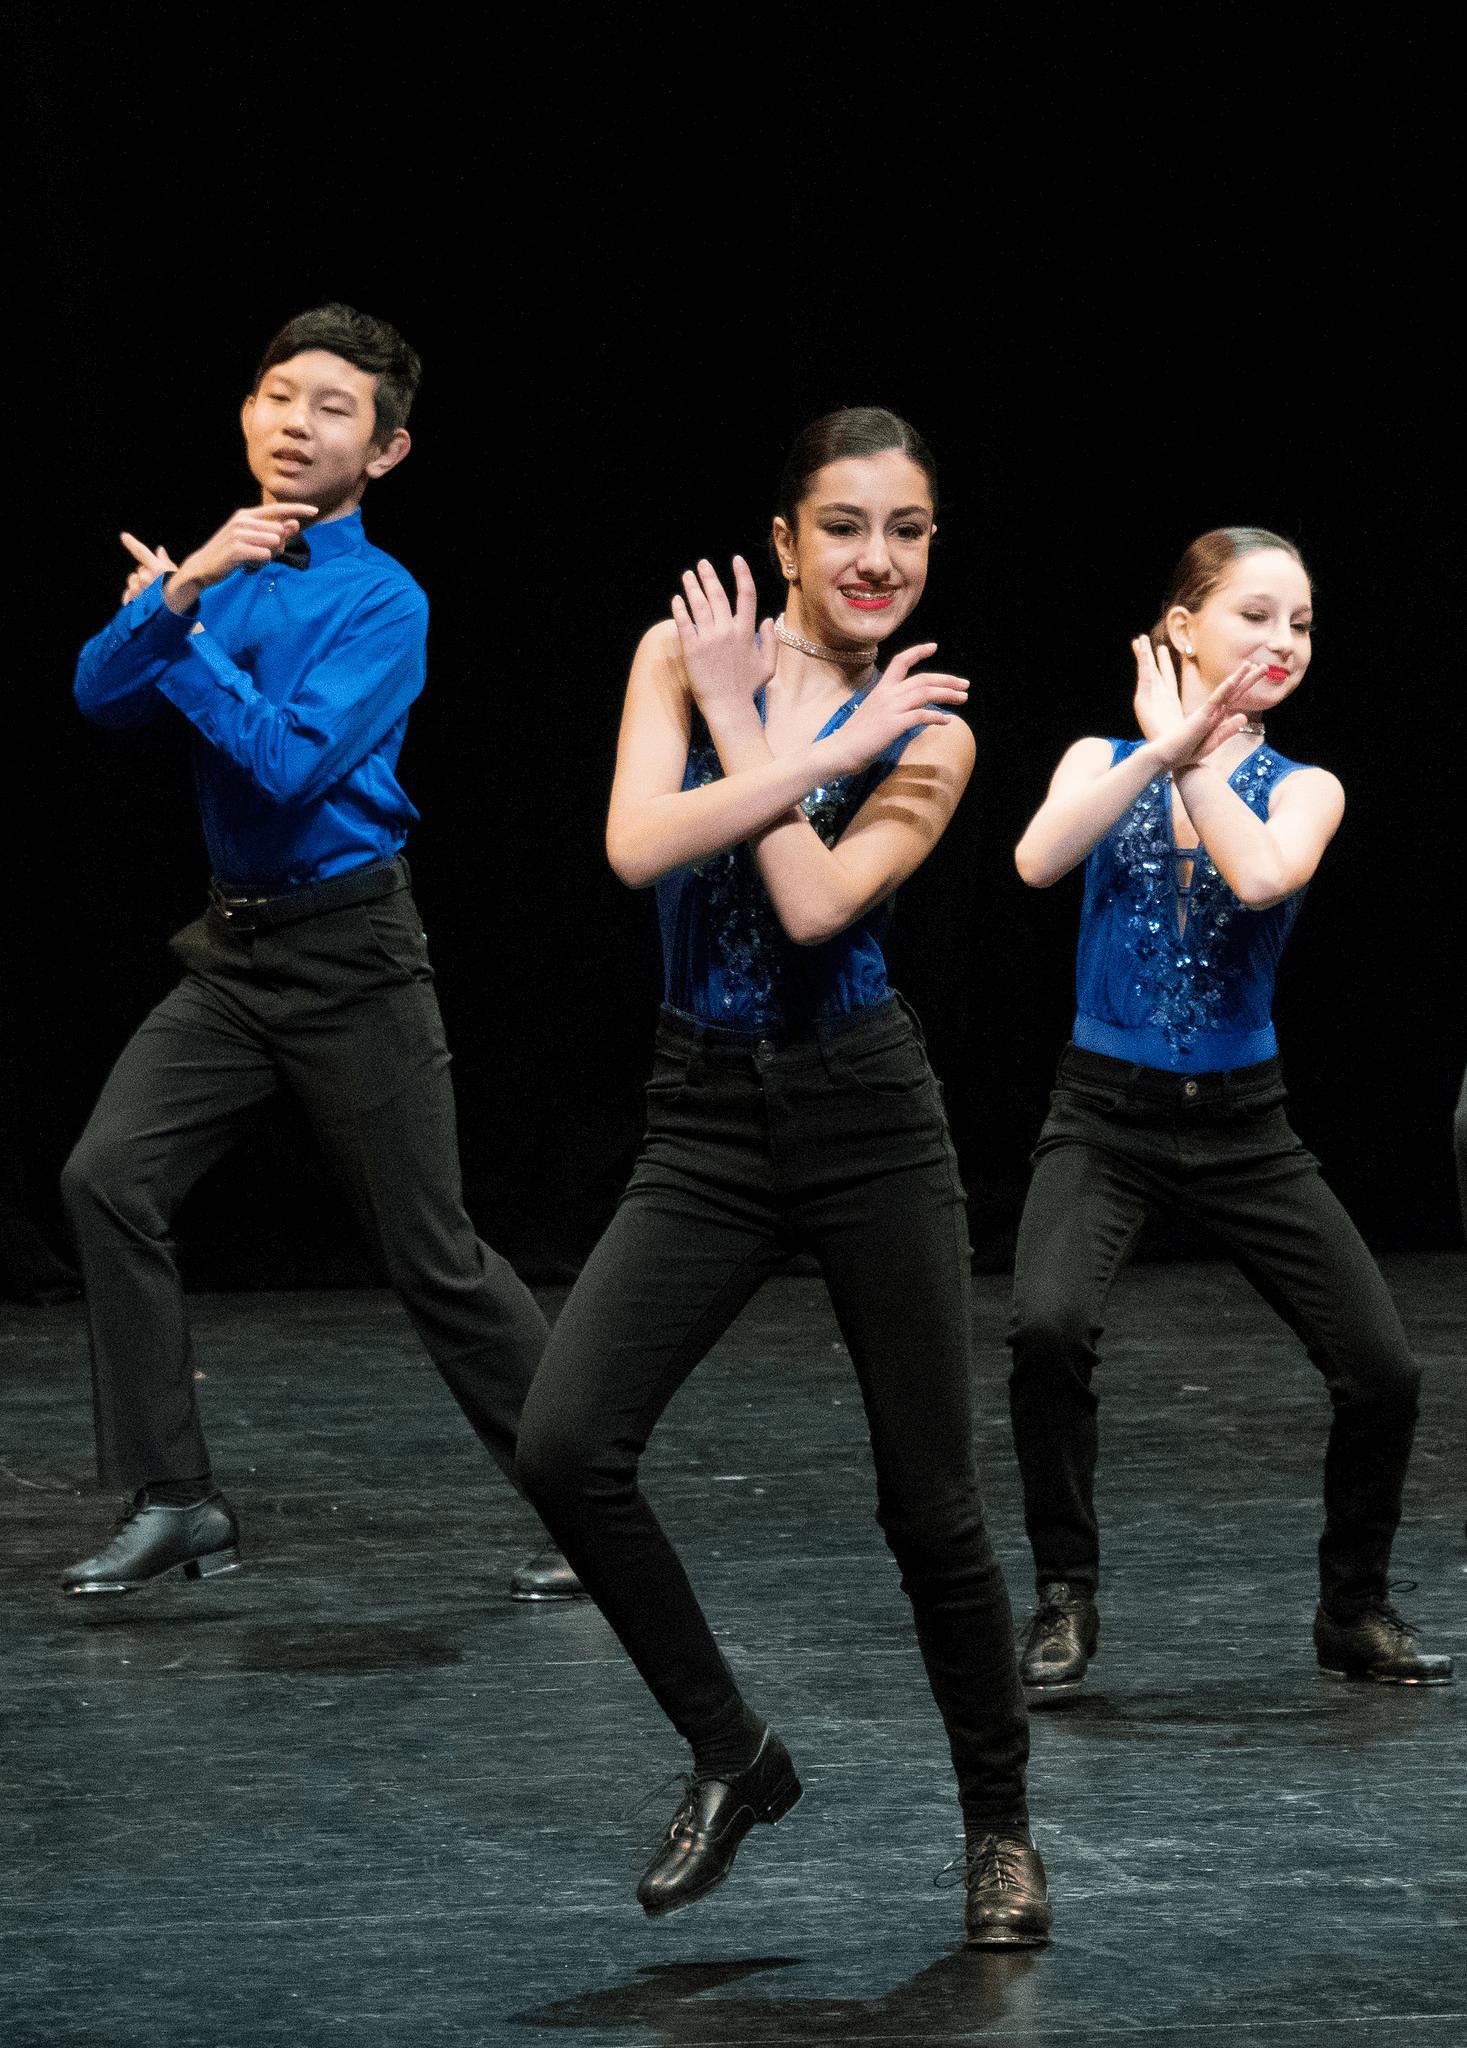 tap dance class in richmond hill